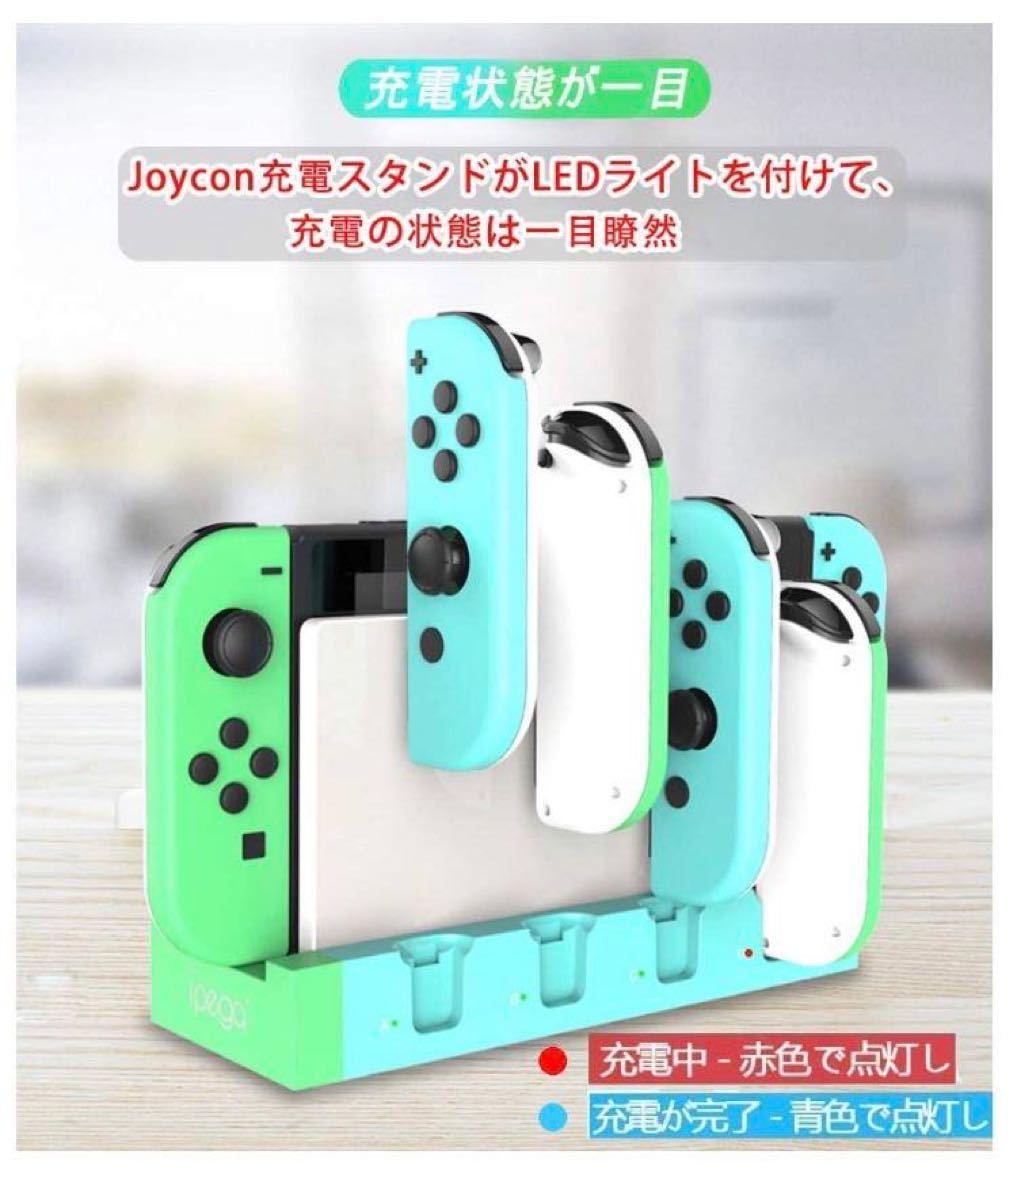 Nintendo Switch Joy-Con 充電スタンド